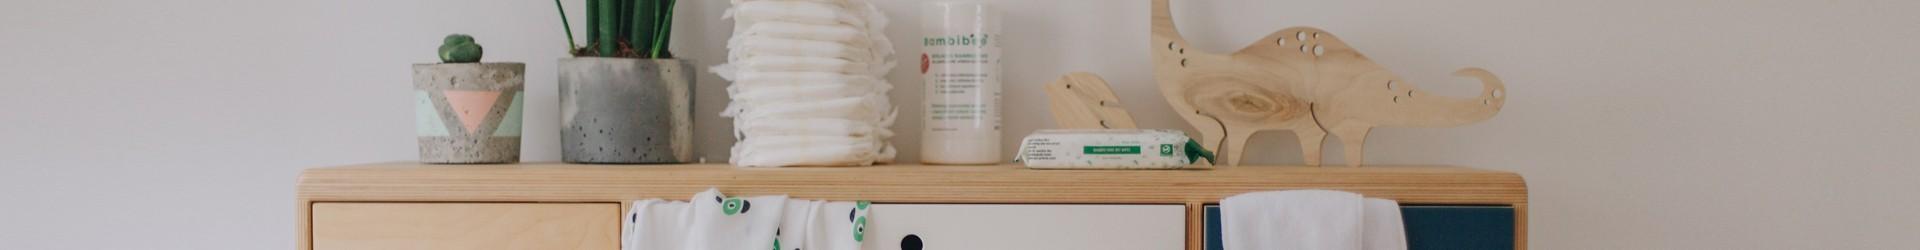 Bamboo fiber diapers, ecological, nature-friendly | Bambiboo.eu